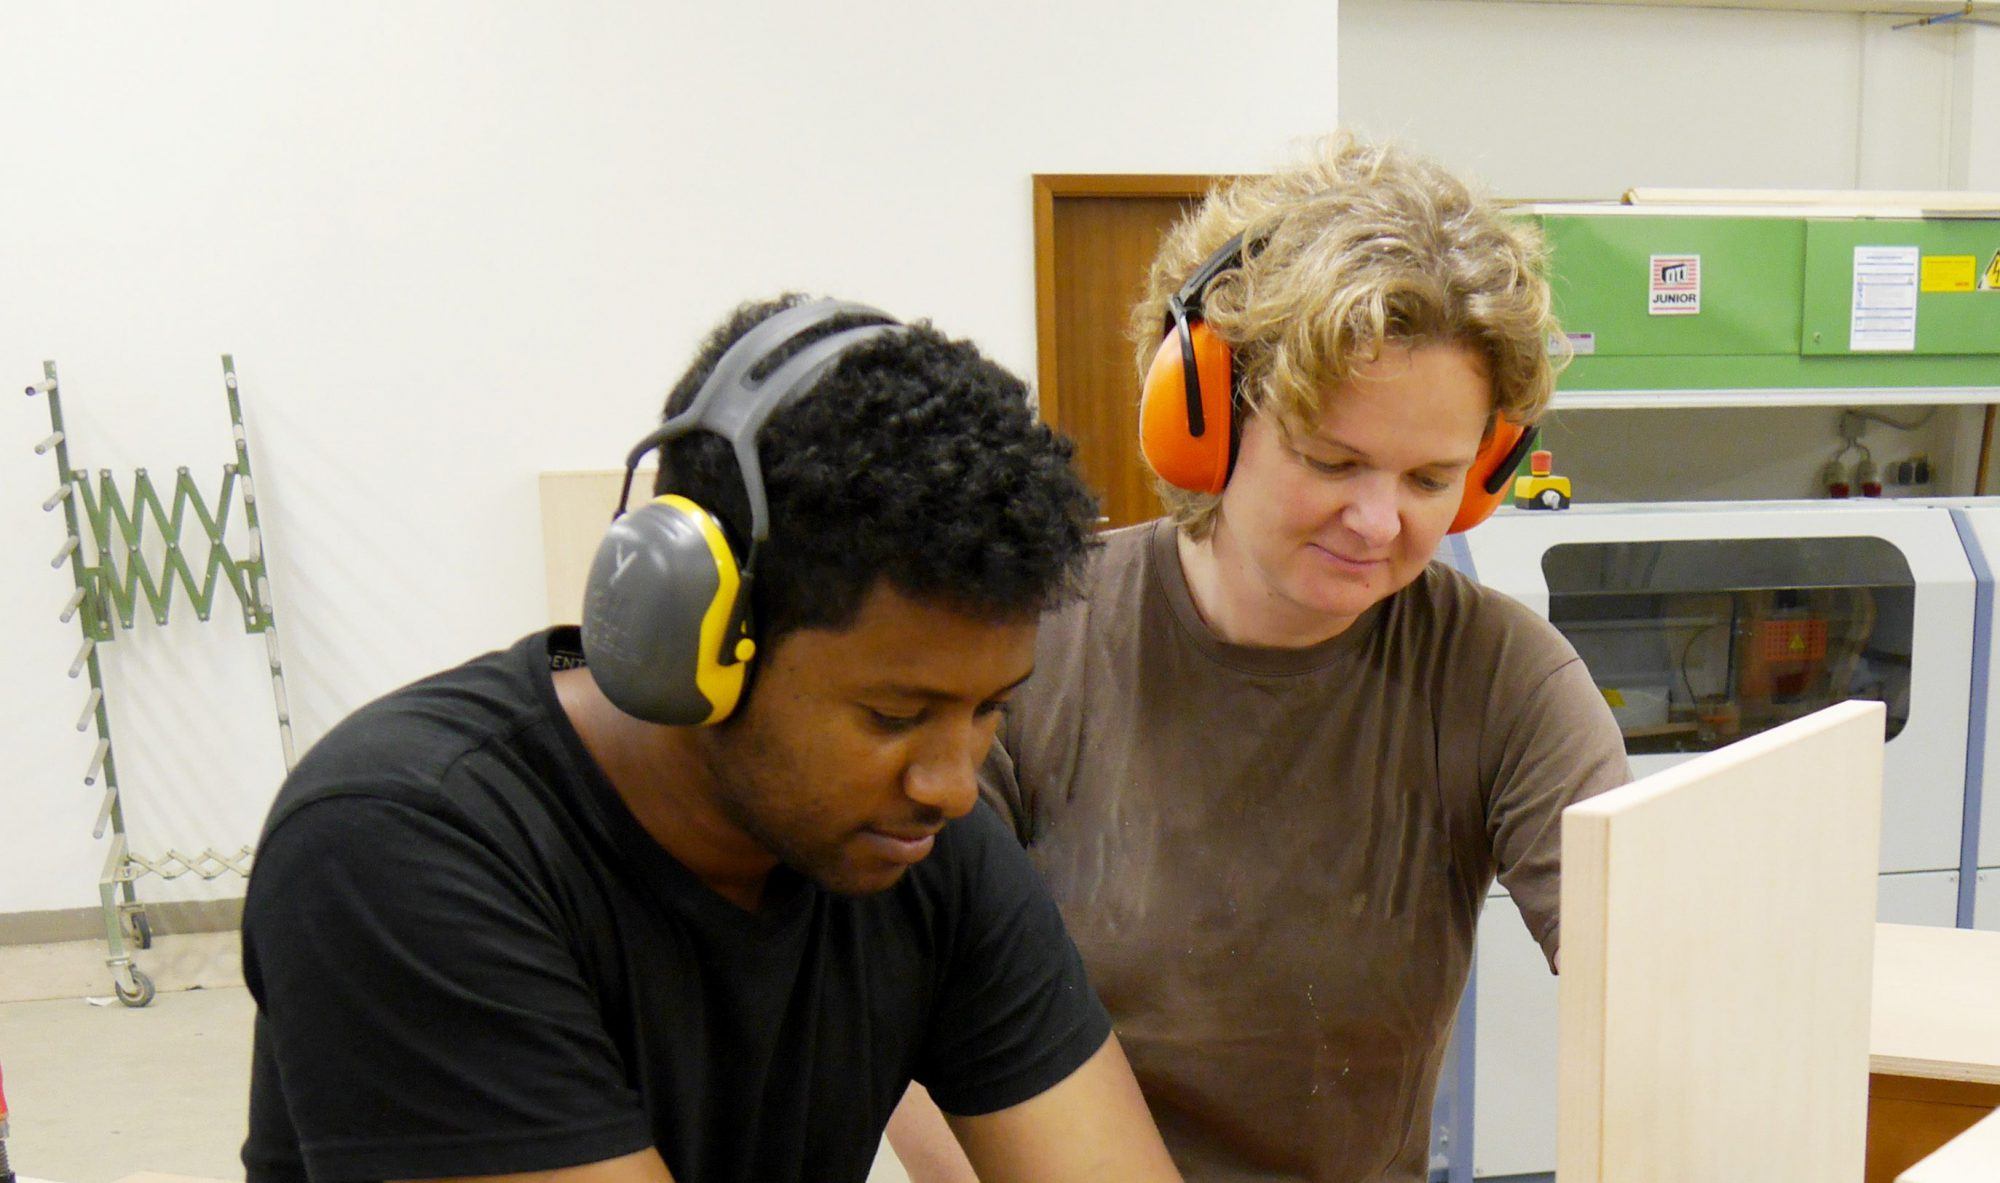 Lernbetrieb Frankfurt - Produktionsschule